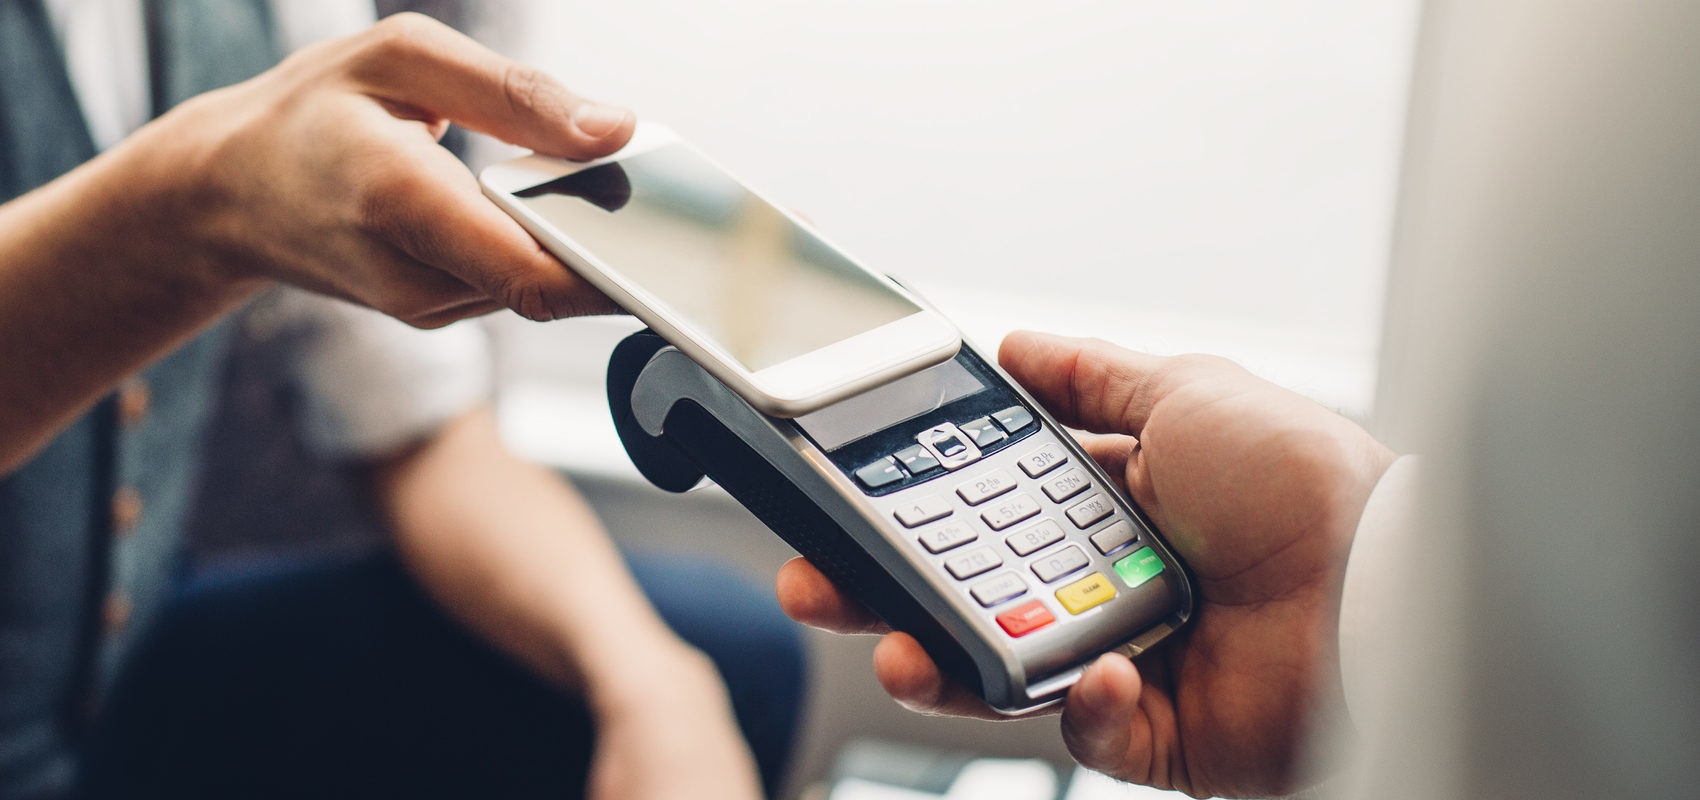 pagamento com e-wallet